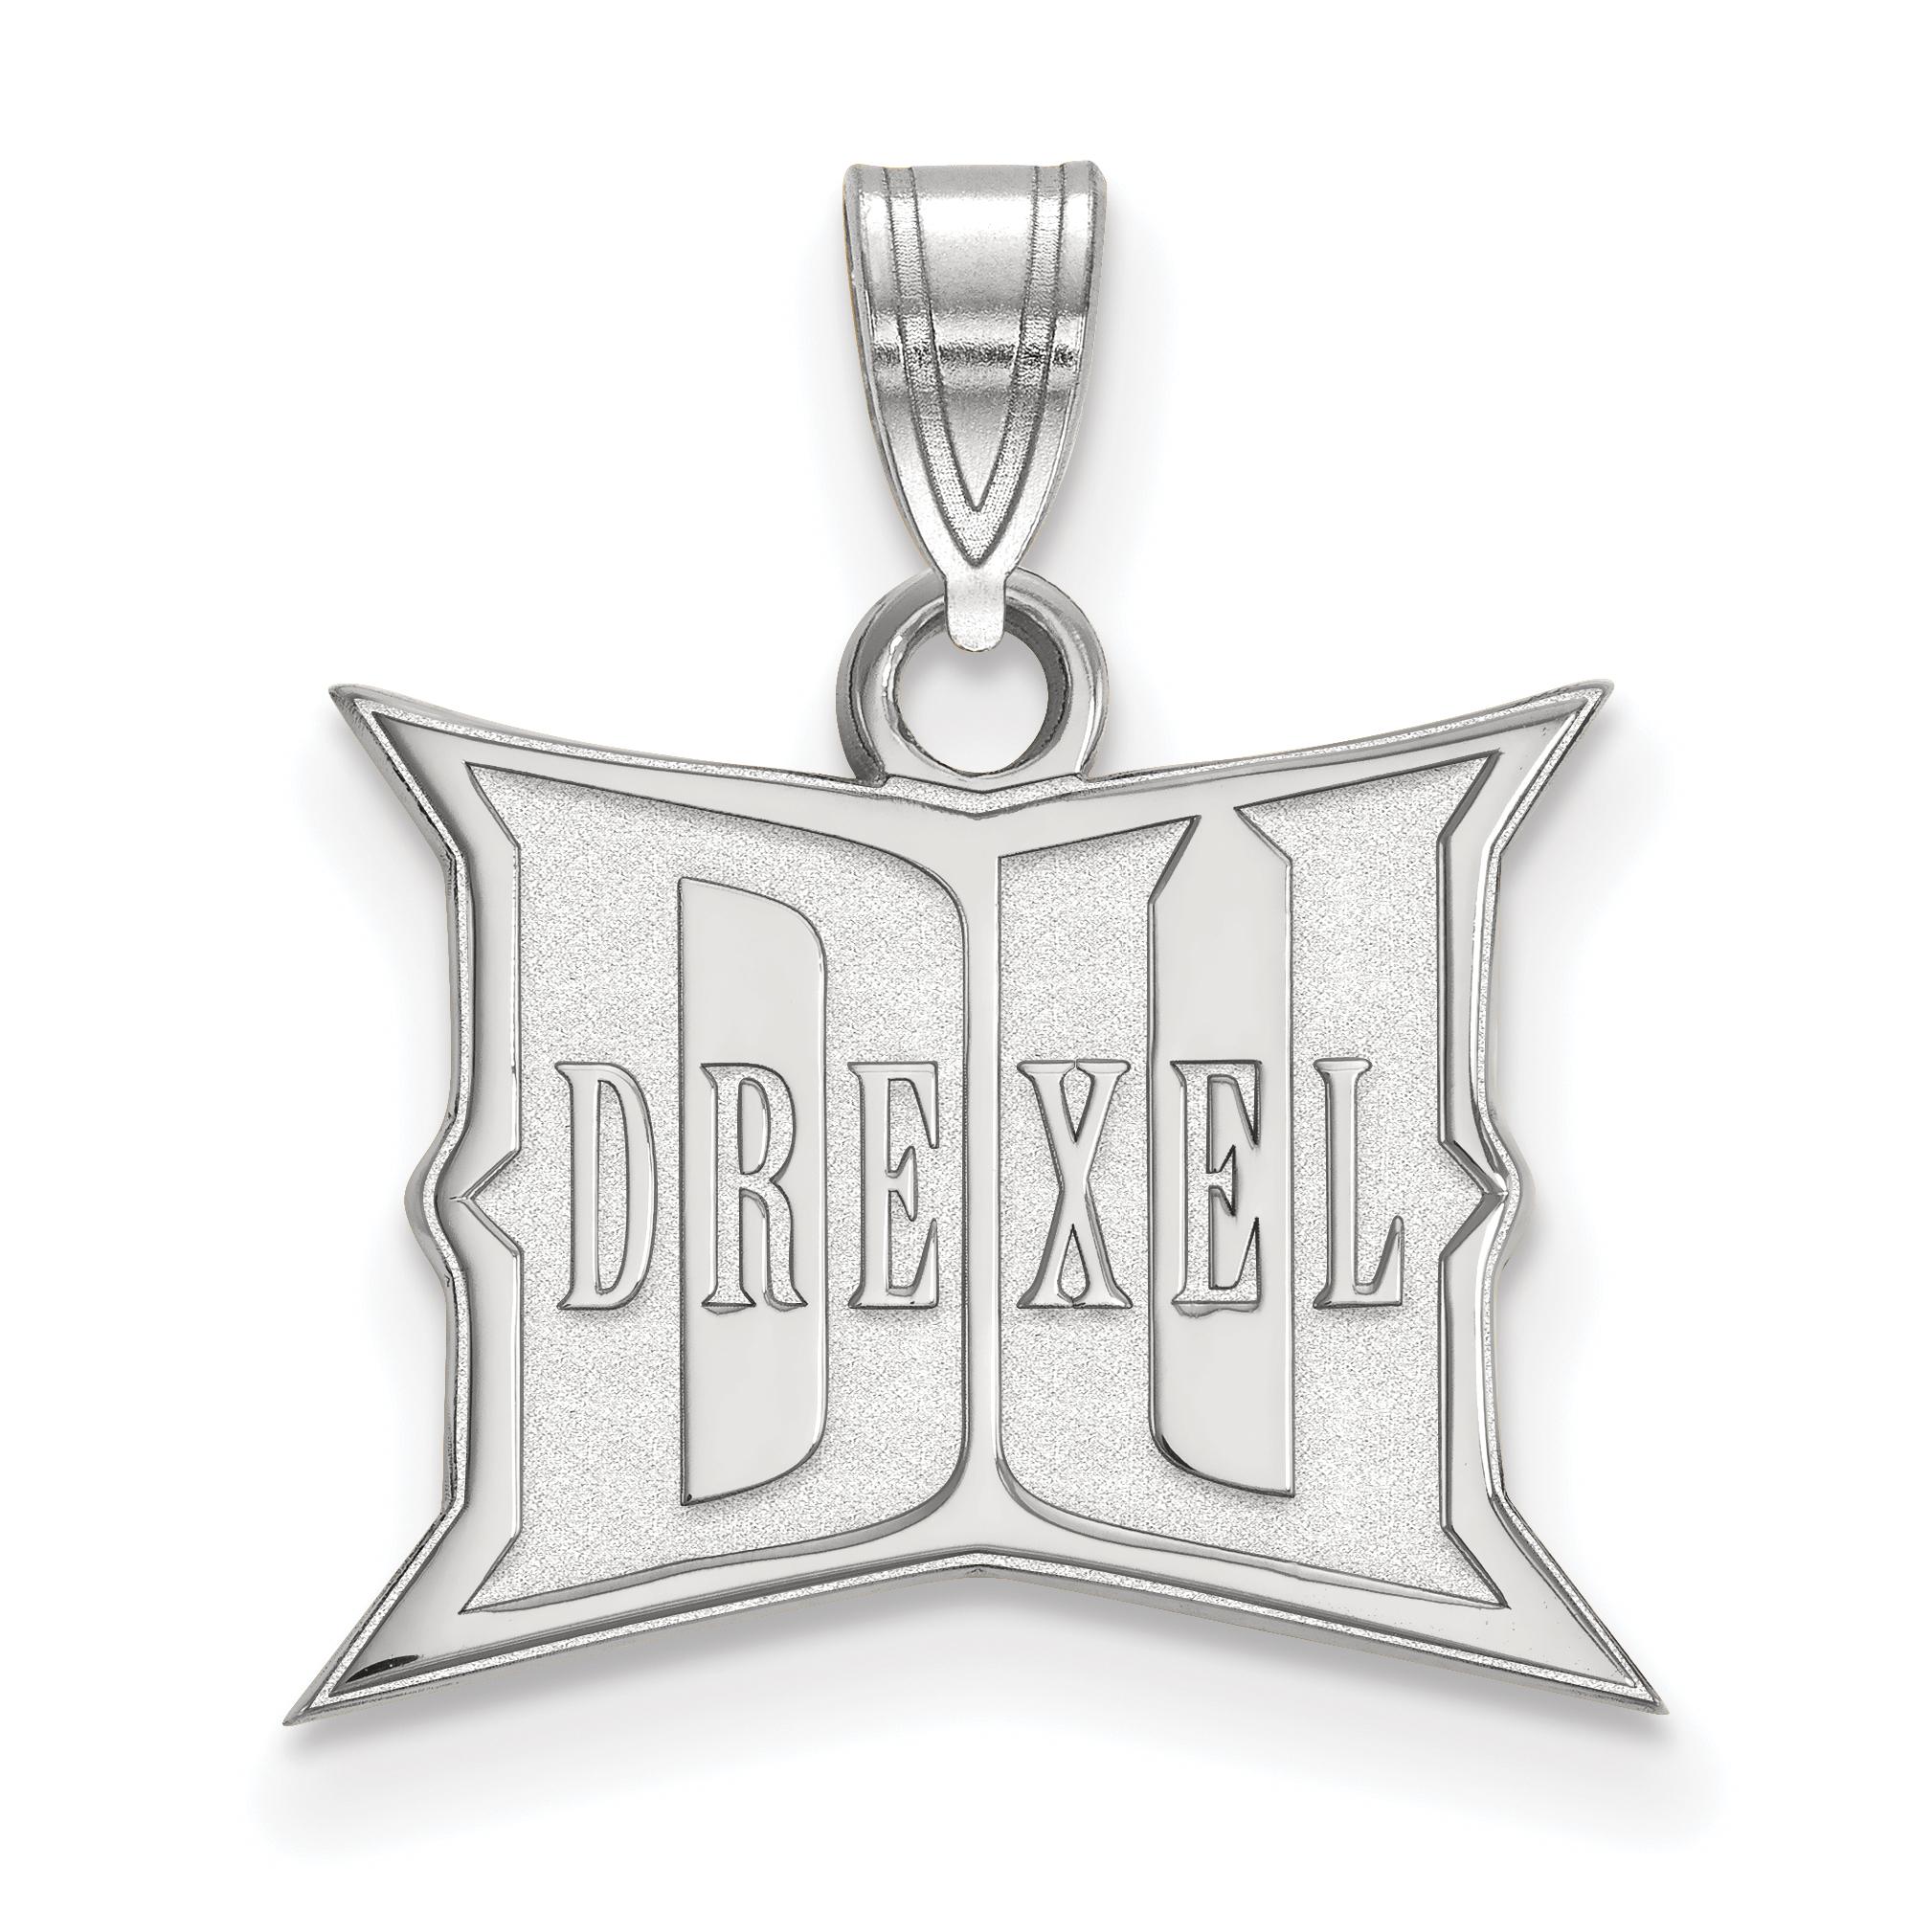 10kw LogoArt Drexel University Small Pendant